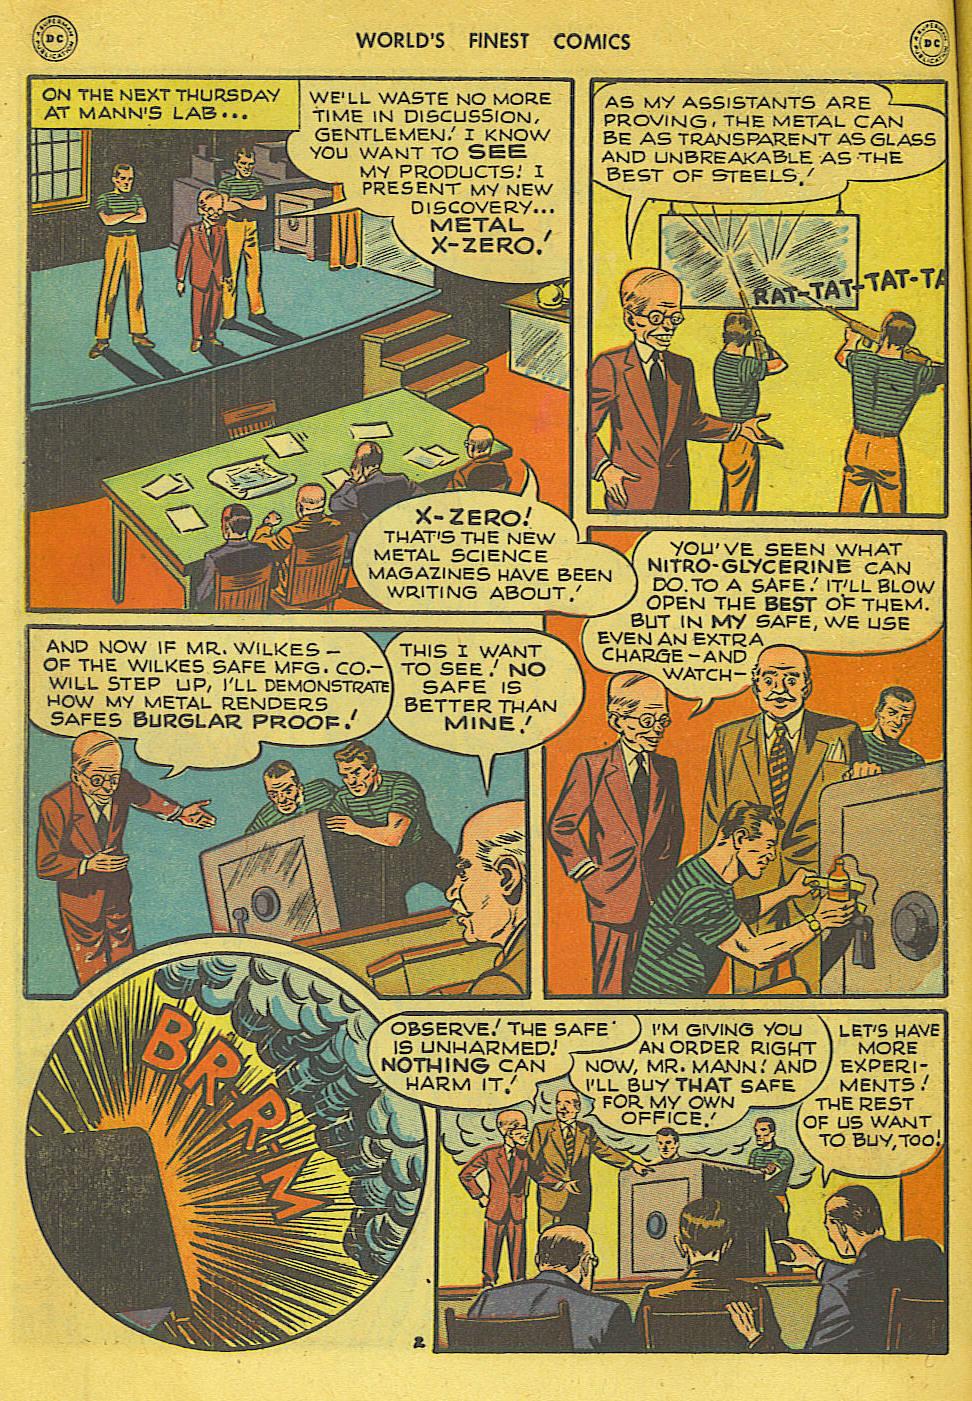 Read online World's Finest Comics comic -  Issue #34 - 42